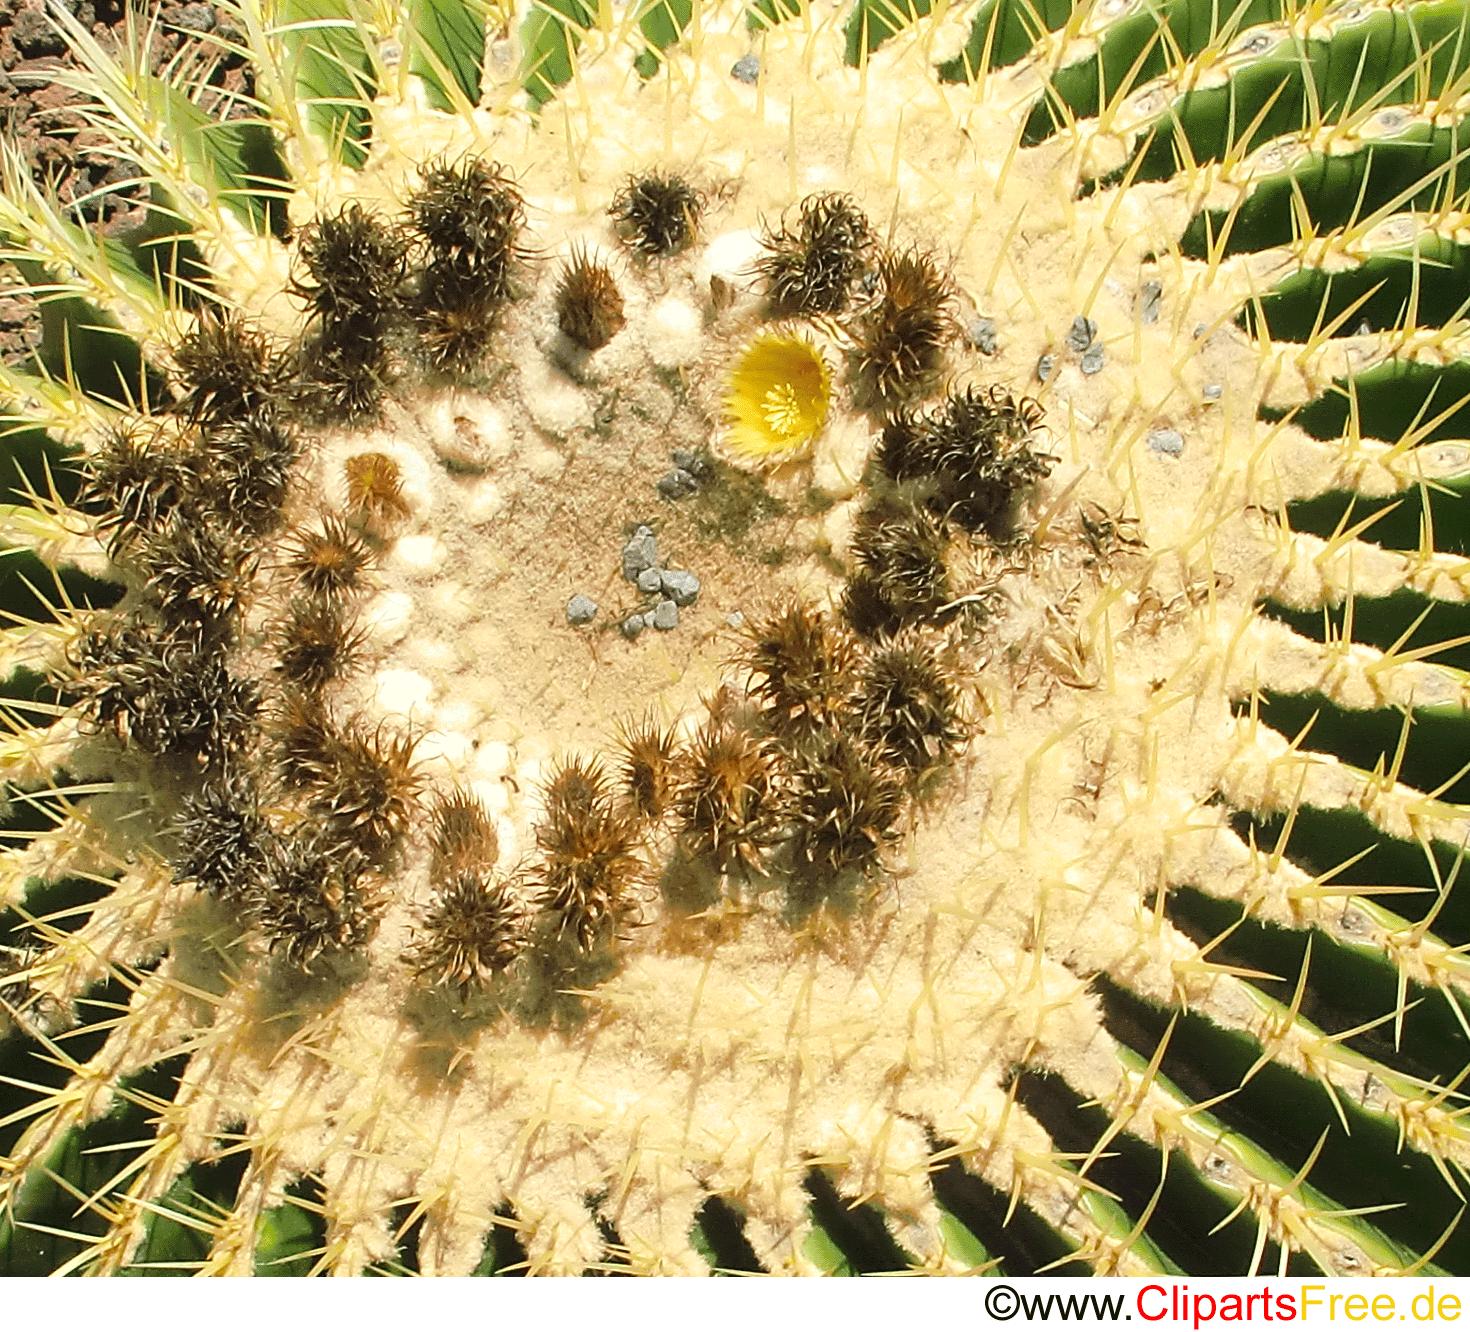 Echinocactus Grusonii Mexico Foto kostenlos